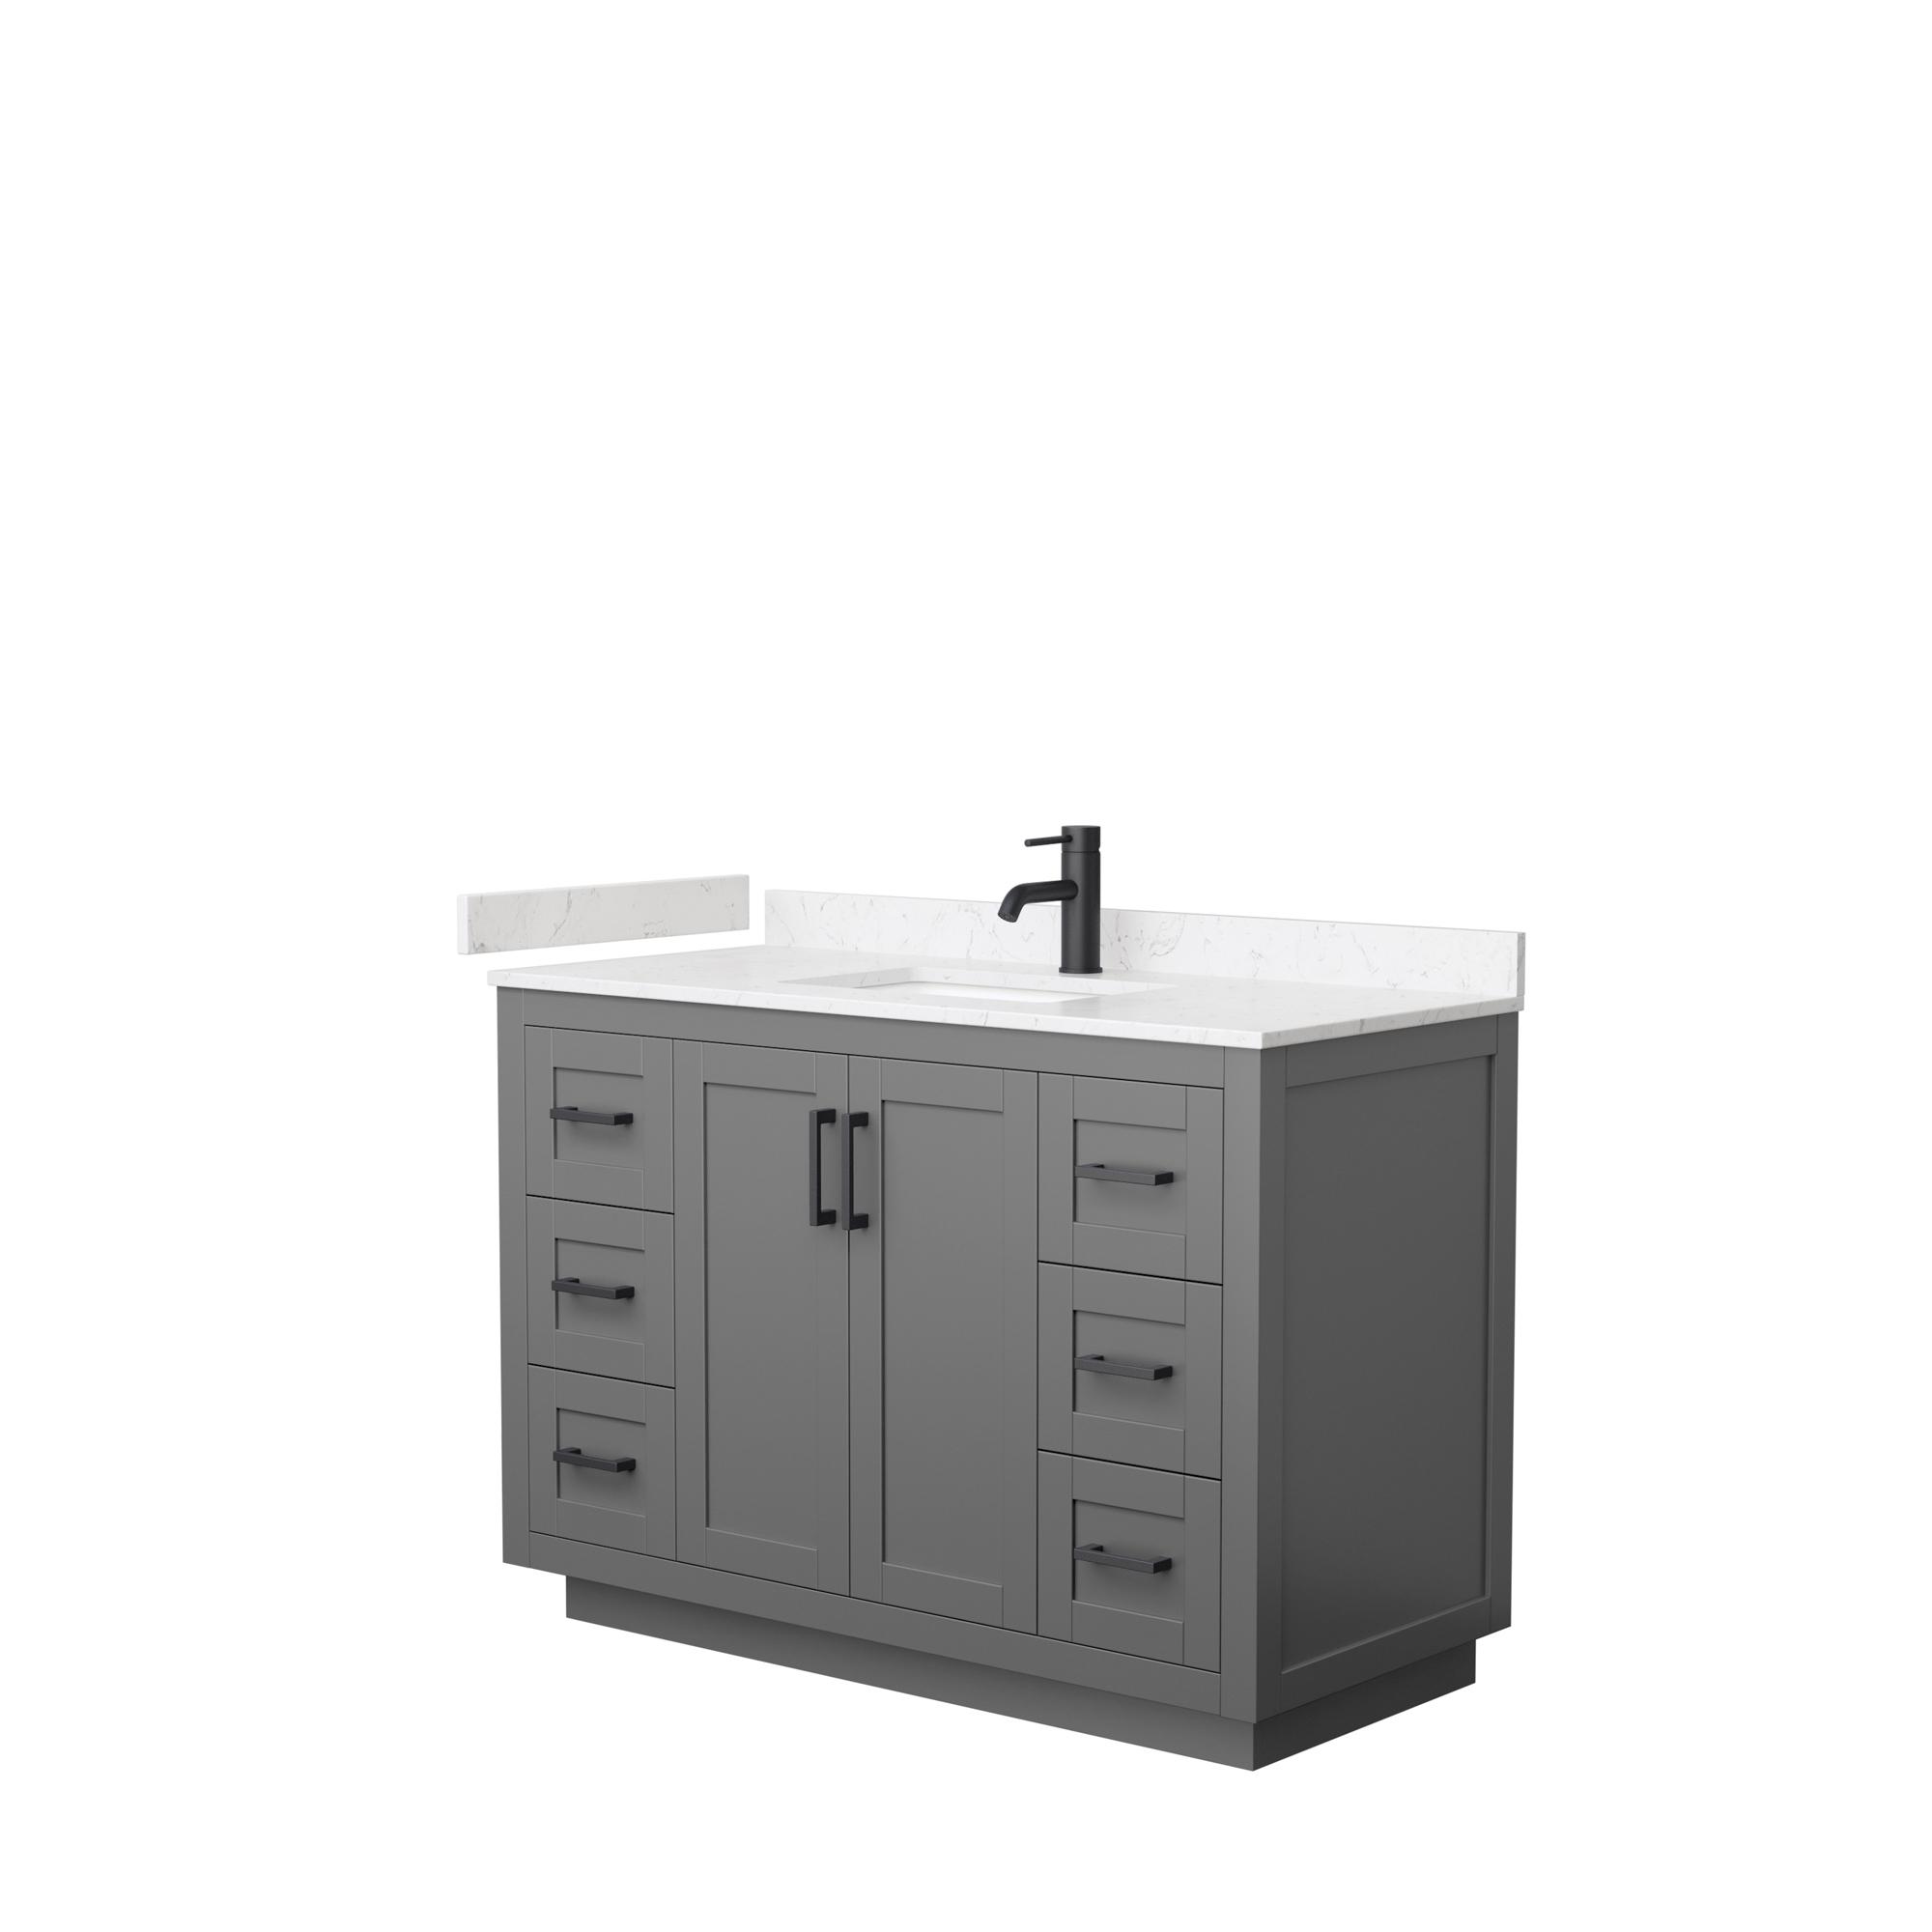 "48"" Single Bathroom Vanity in Dark Gray, Light-Vein Carrara Cultured Marble Countertop, Undermount Square Sink, Matte Black Trim"